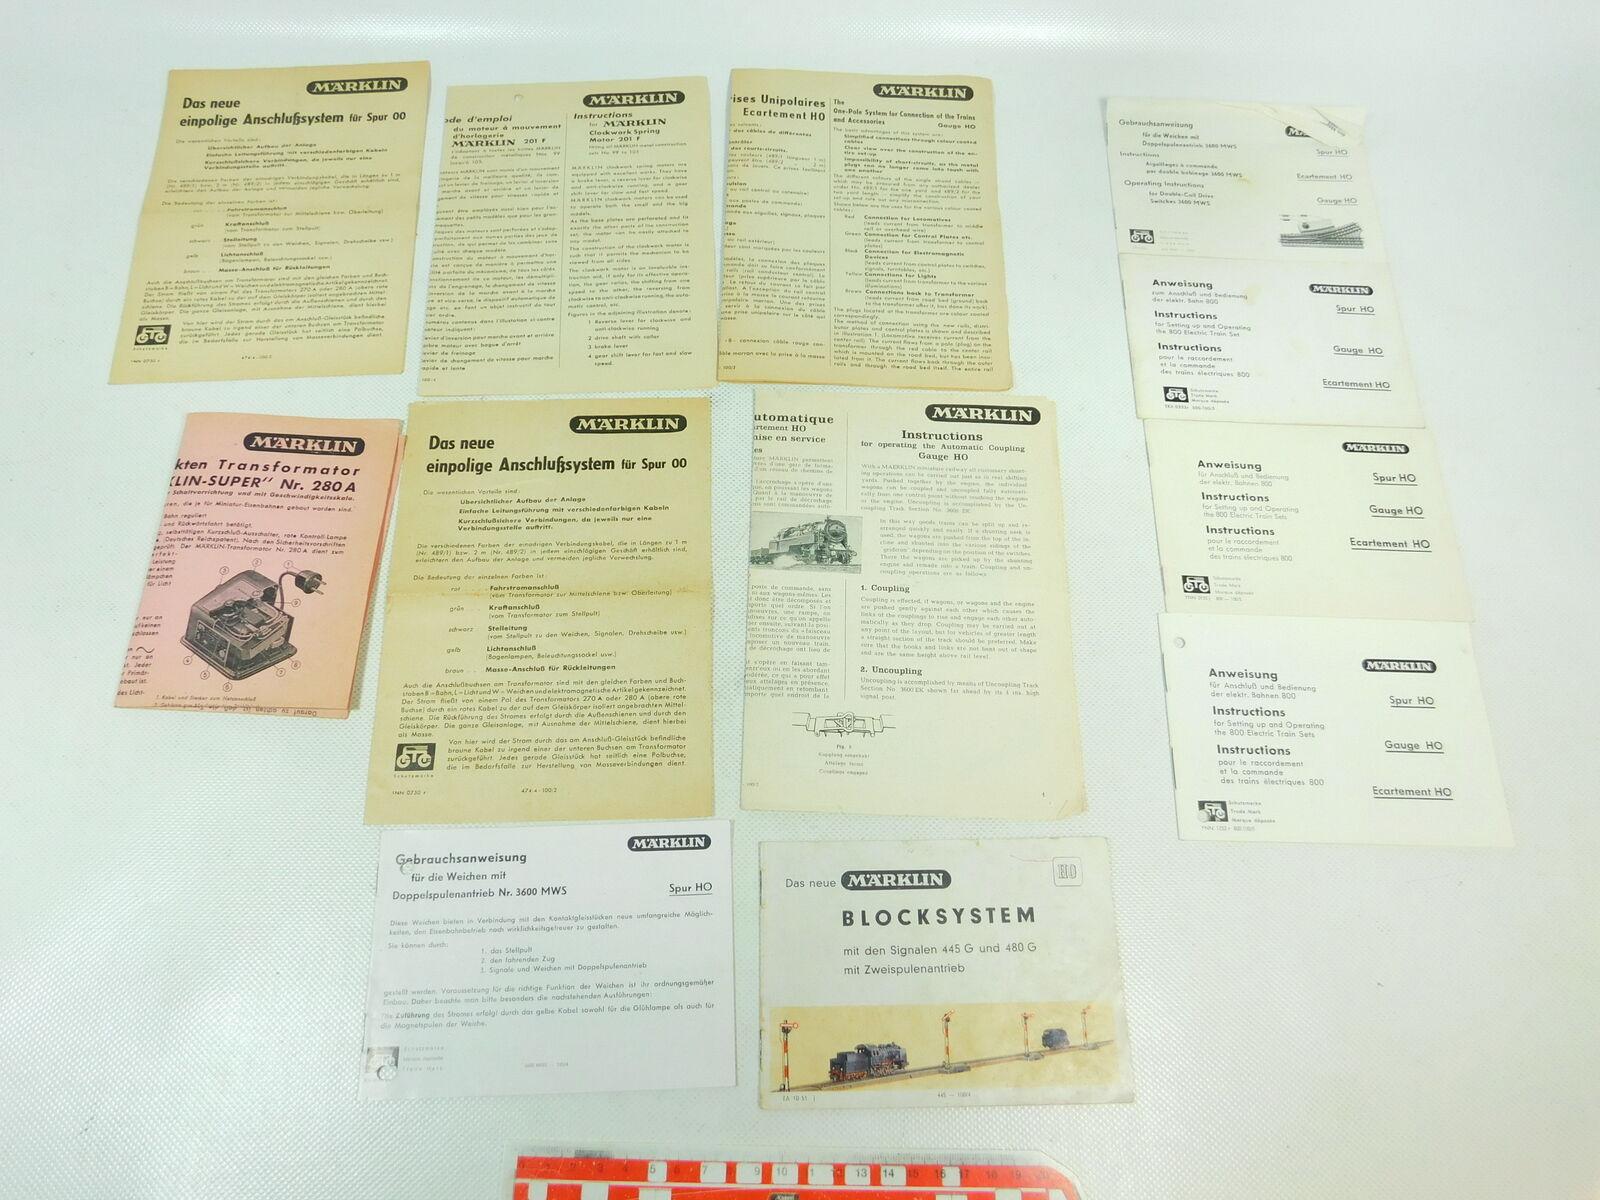 Bh825-0, 5 pieces märklin h0 00 instructions train 800, 3600, 445g 480g,280a